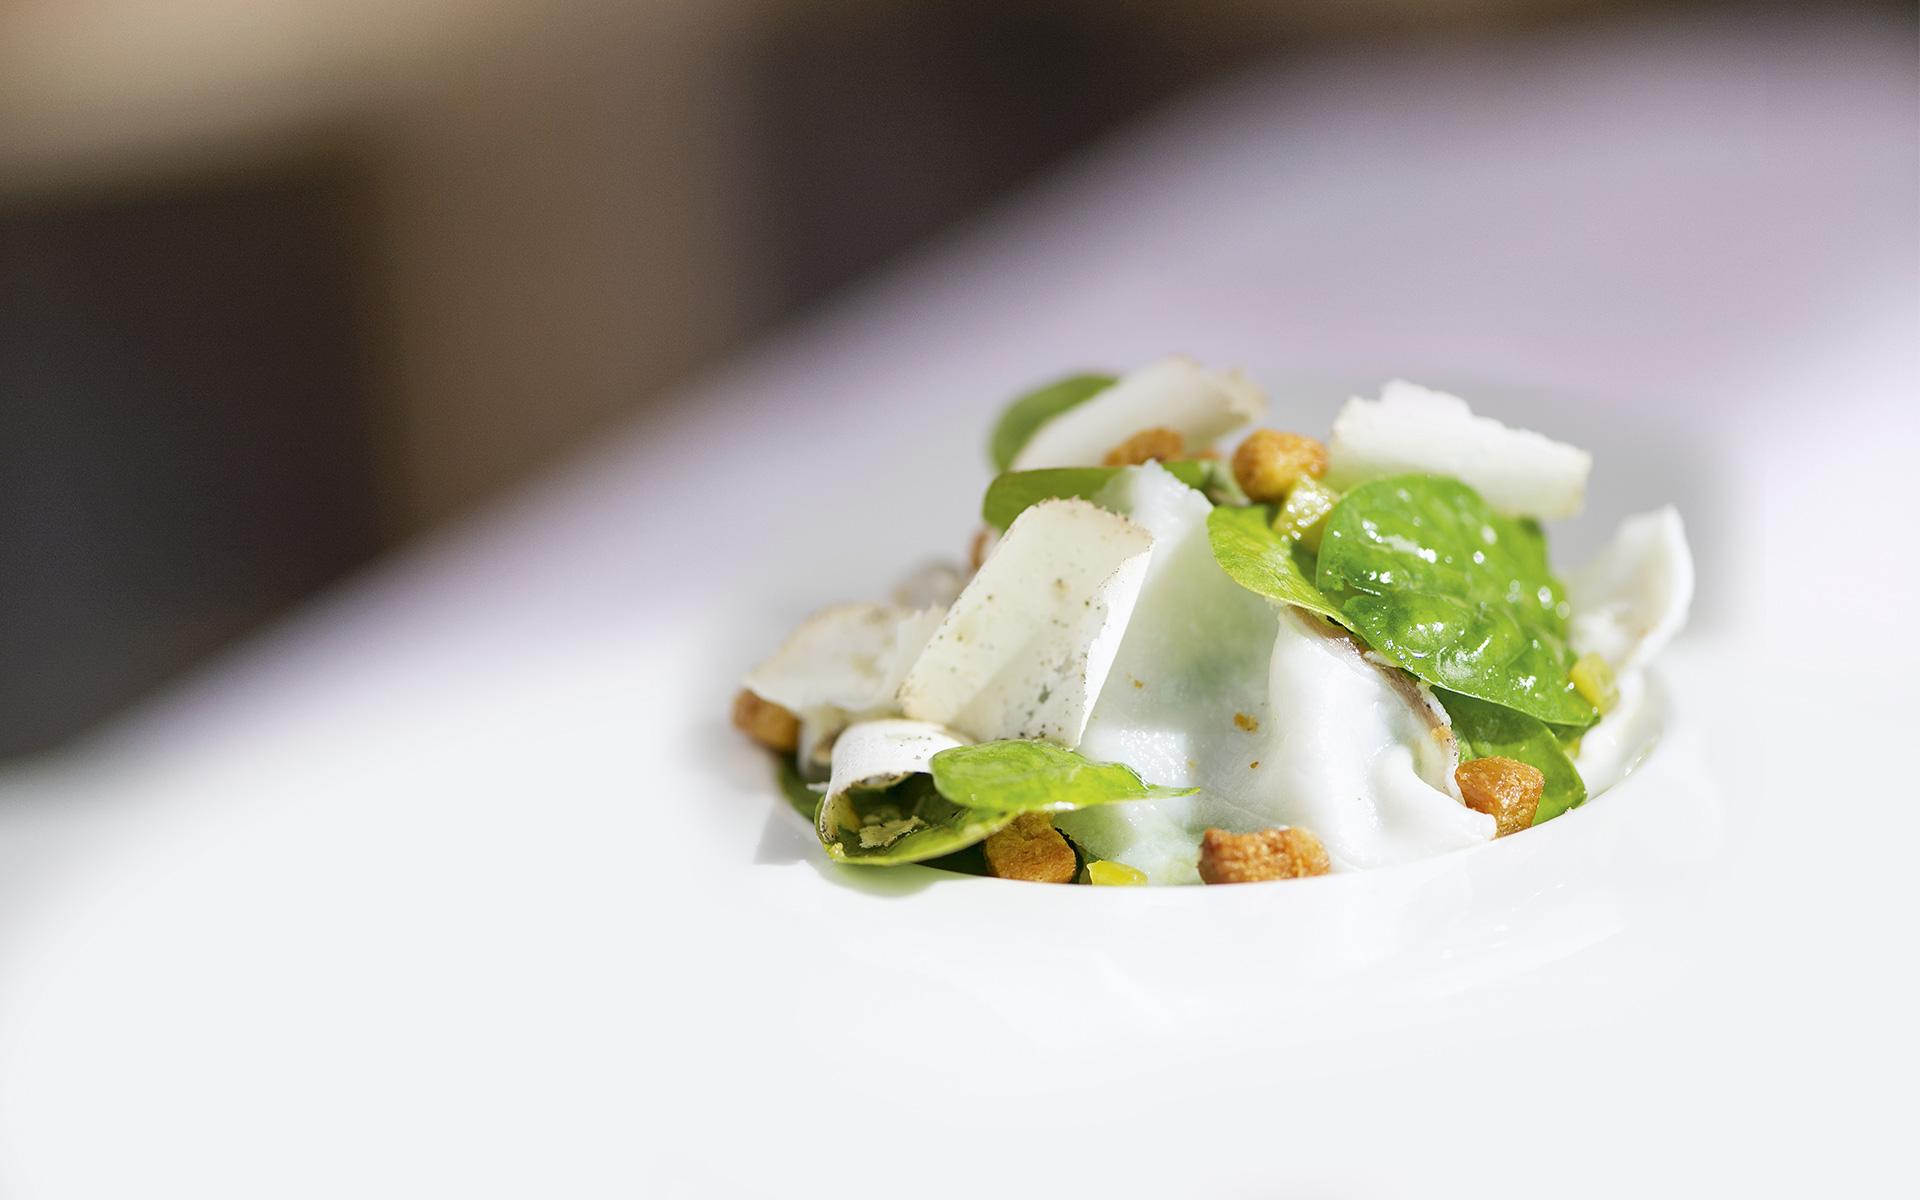 Spinatsalat mit Rhabarberdressing, Croutons und Lardo